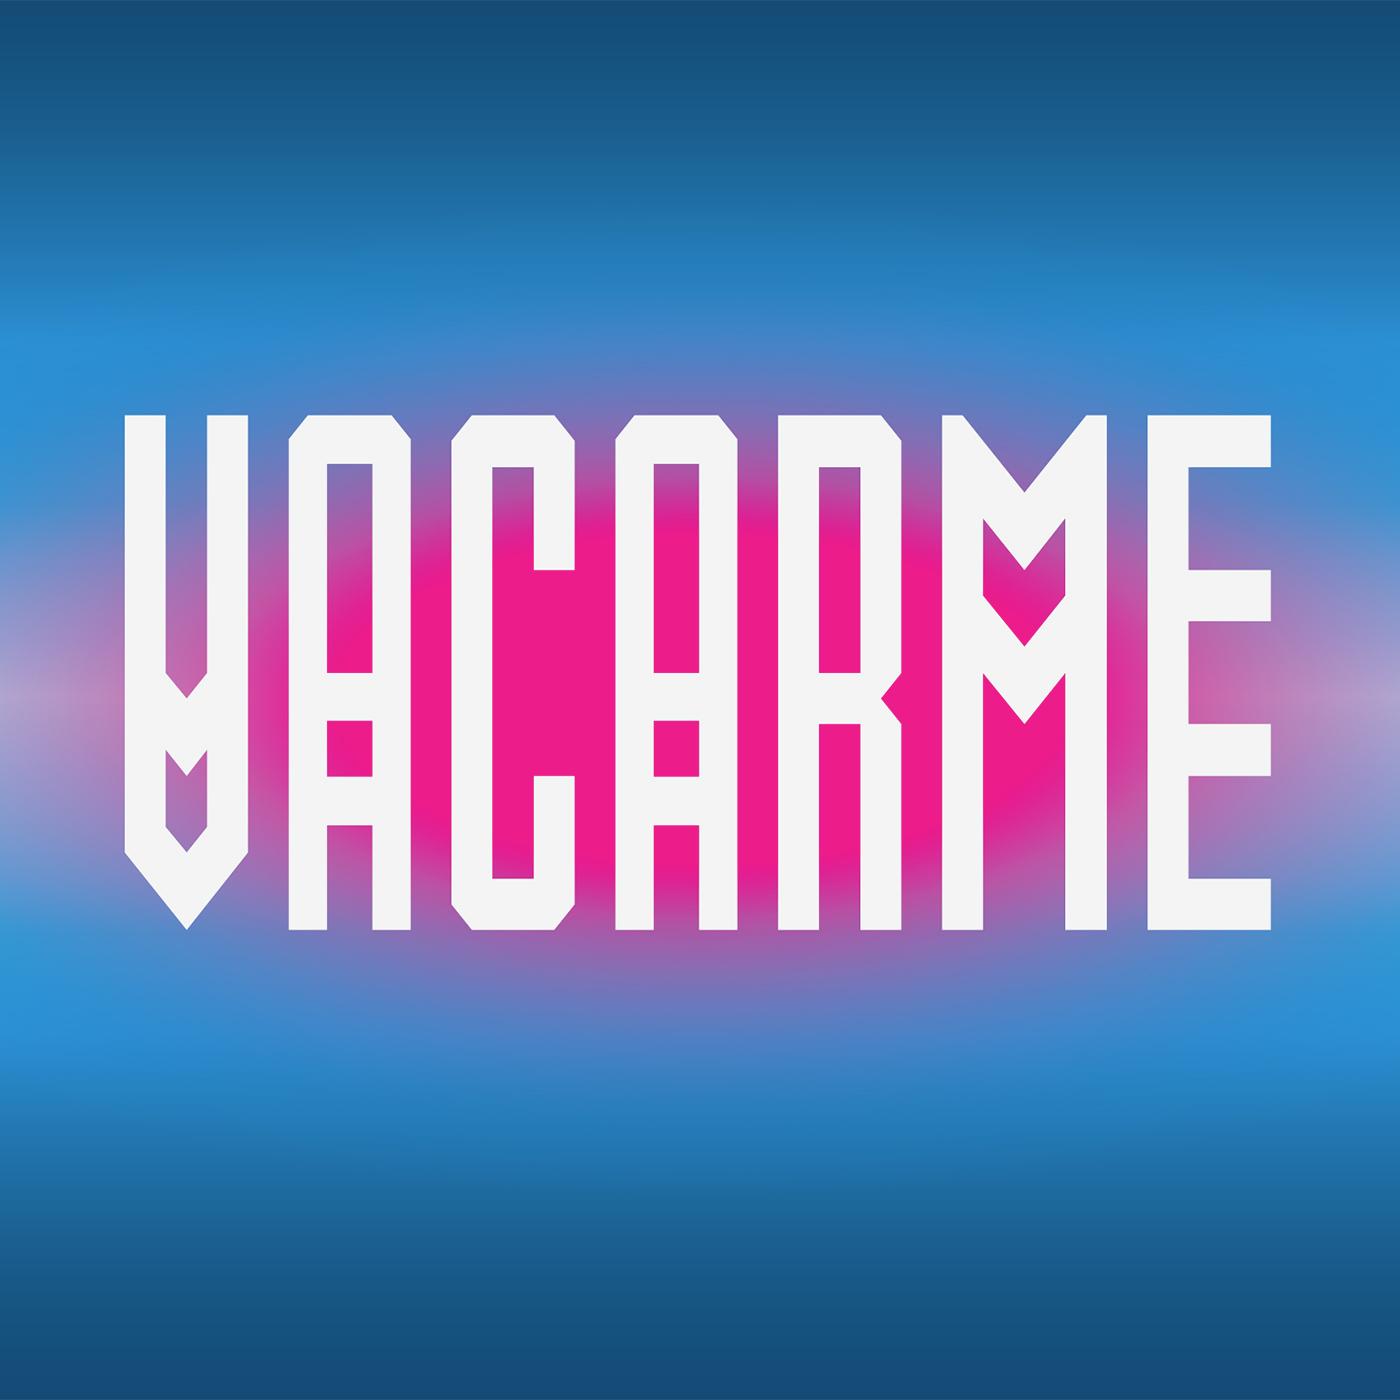 Vacarme (logo podcast)